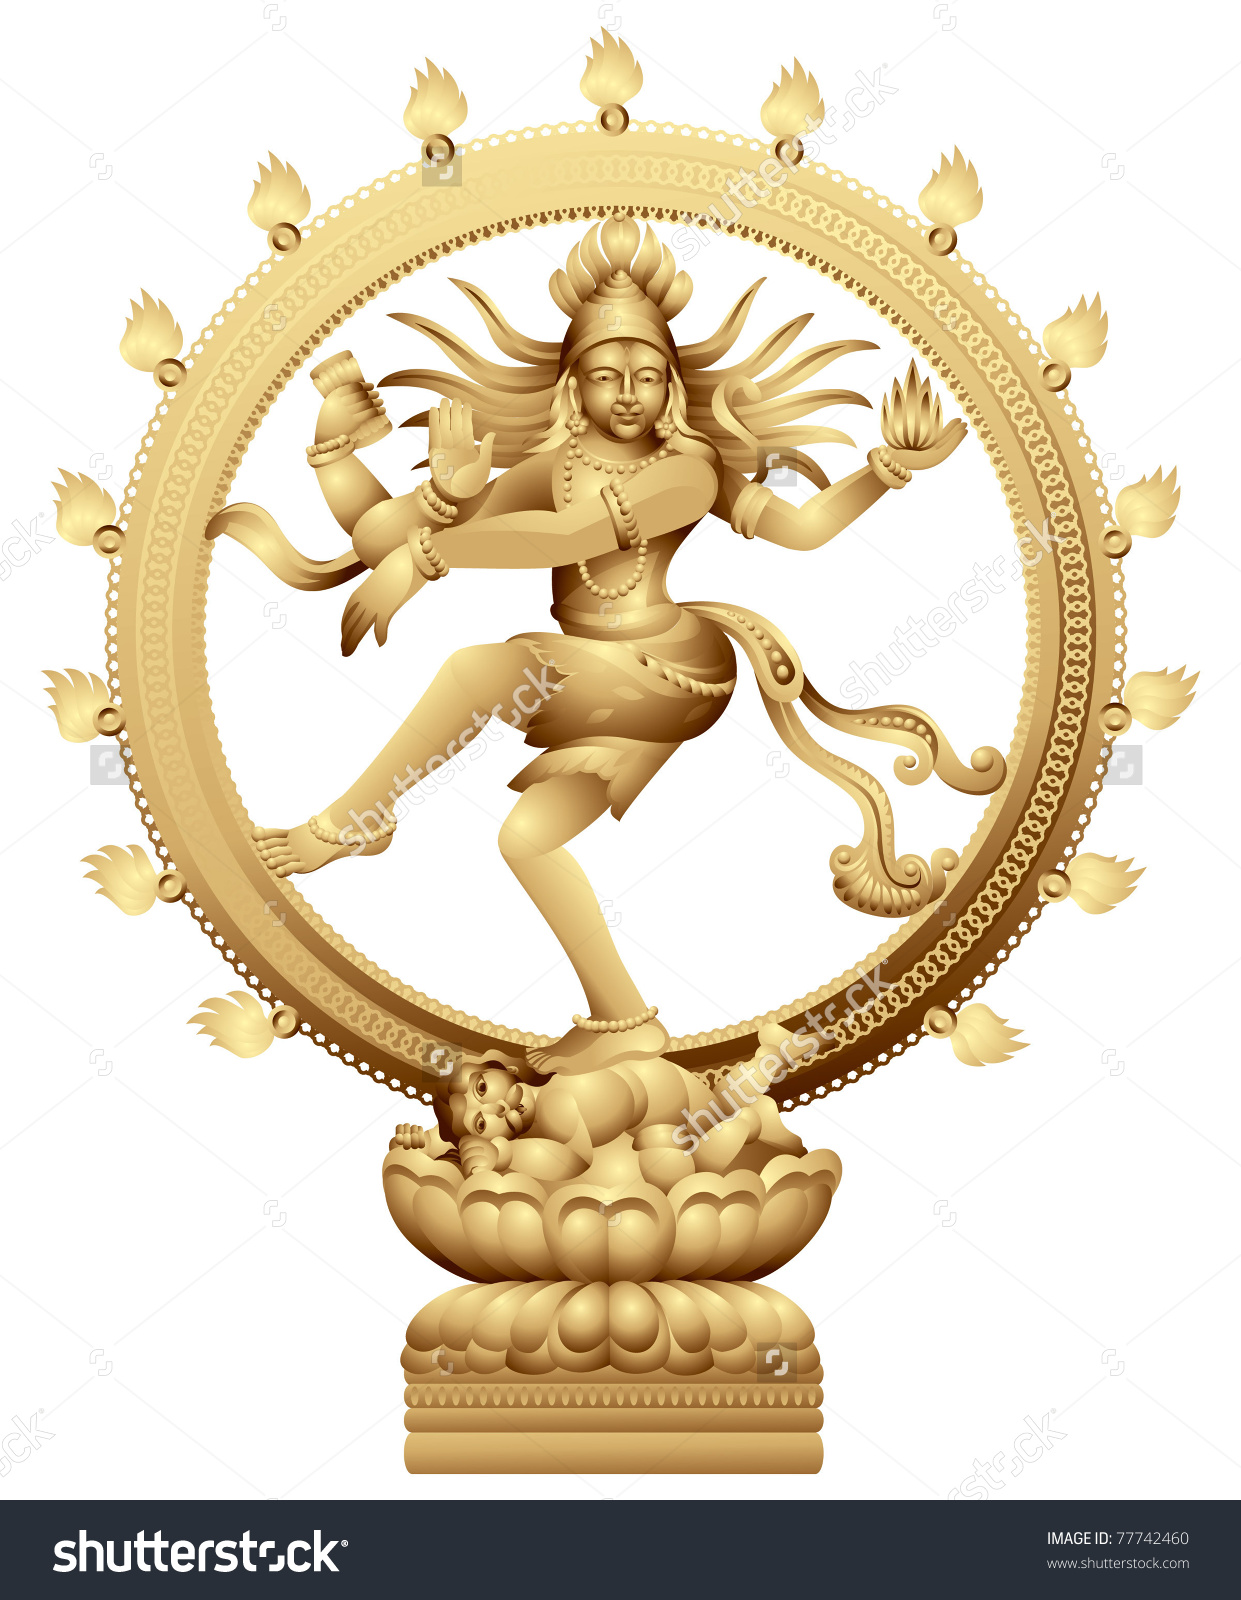 Dancing Shiva Statue Indian Hindu God Stock Vector 77742460.